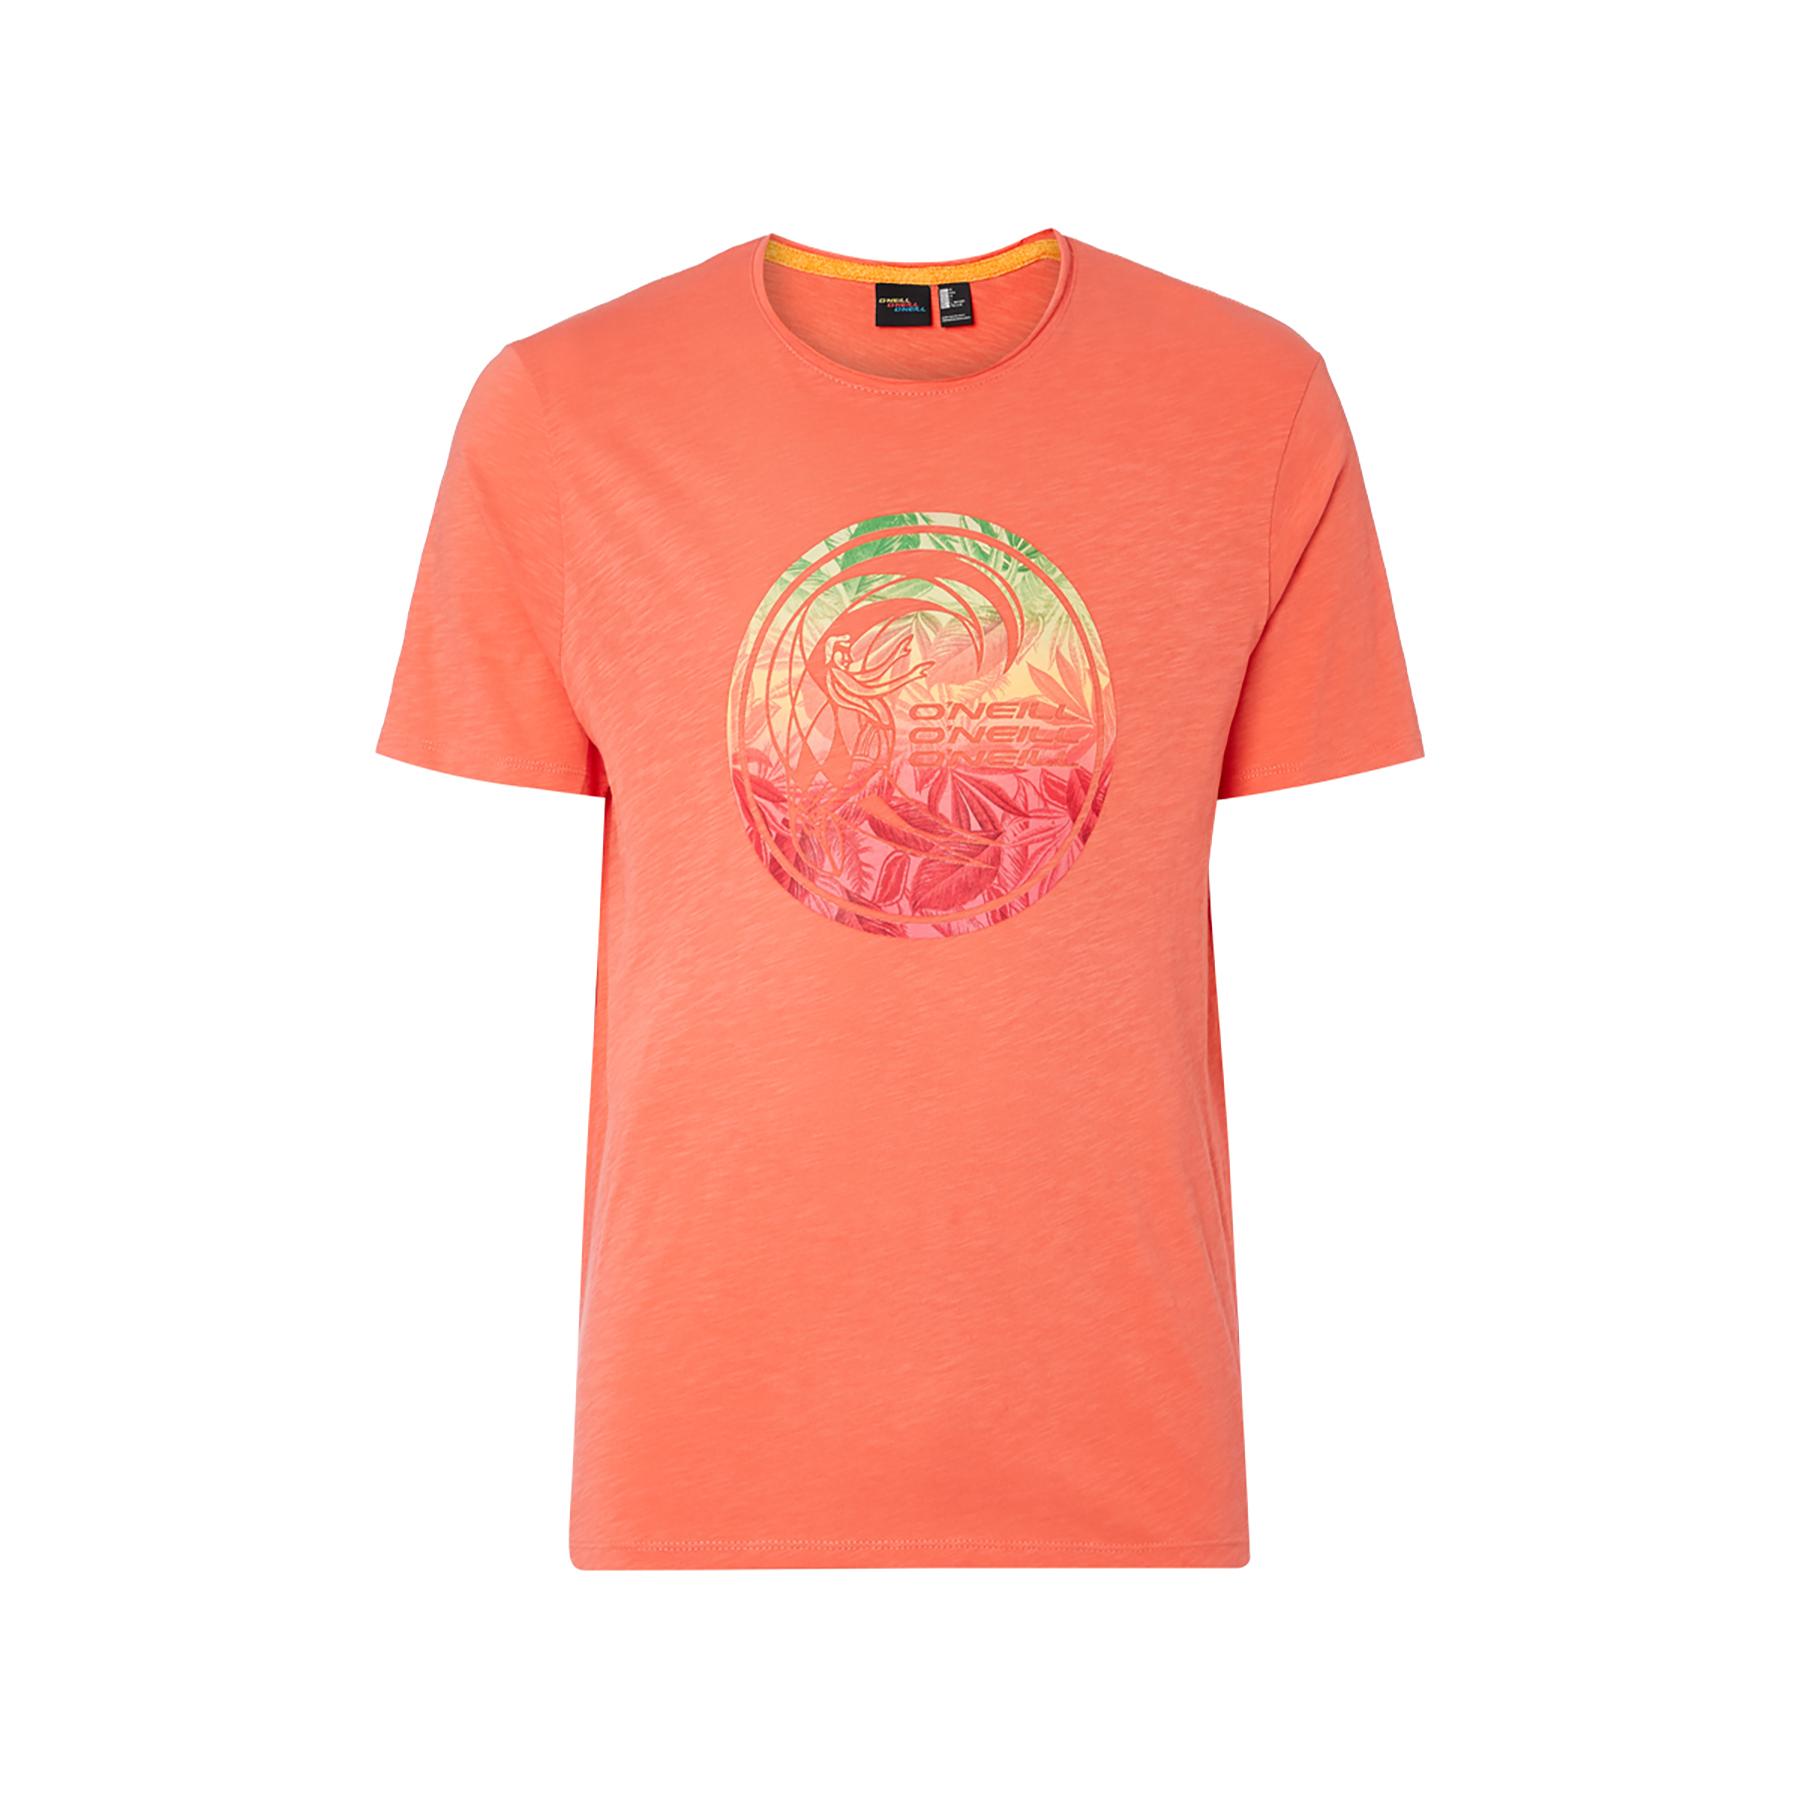 4fed8317189e Tričko Oneill LM oranžové